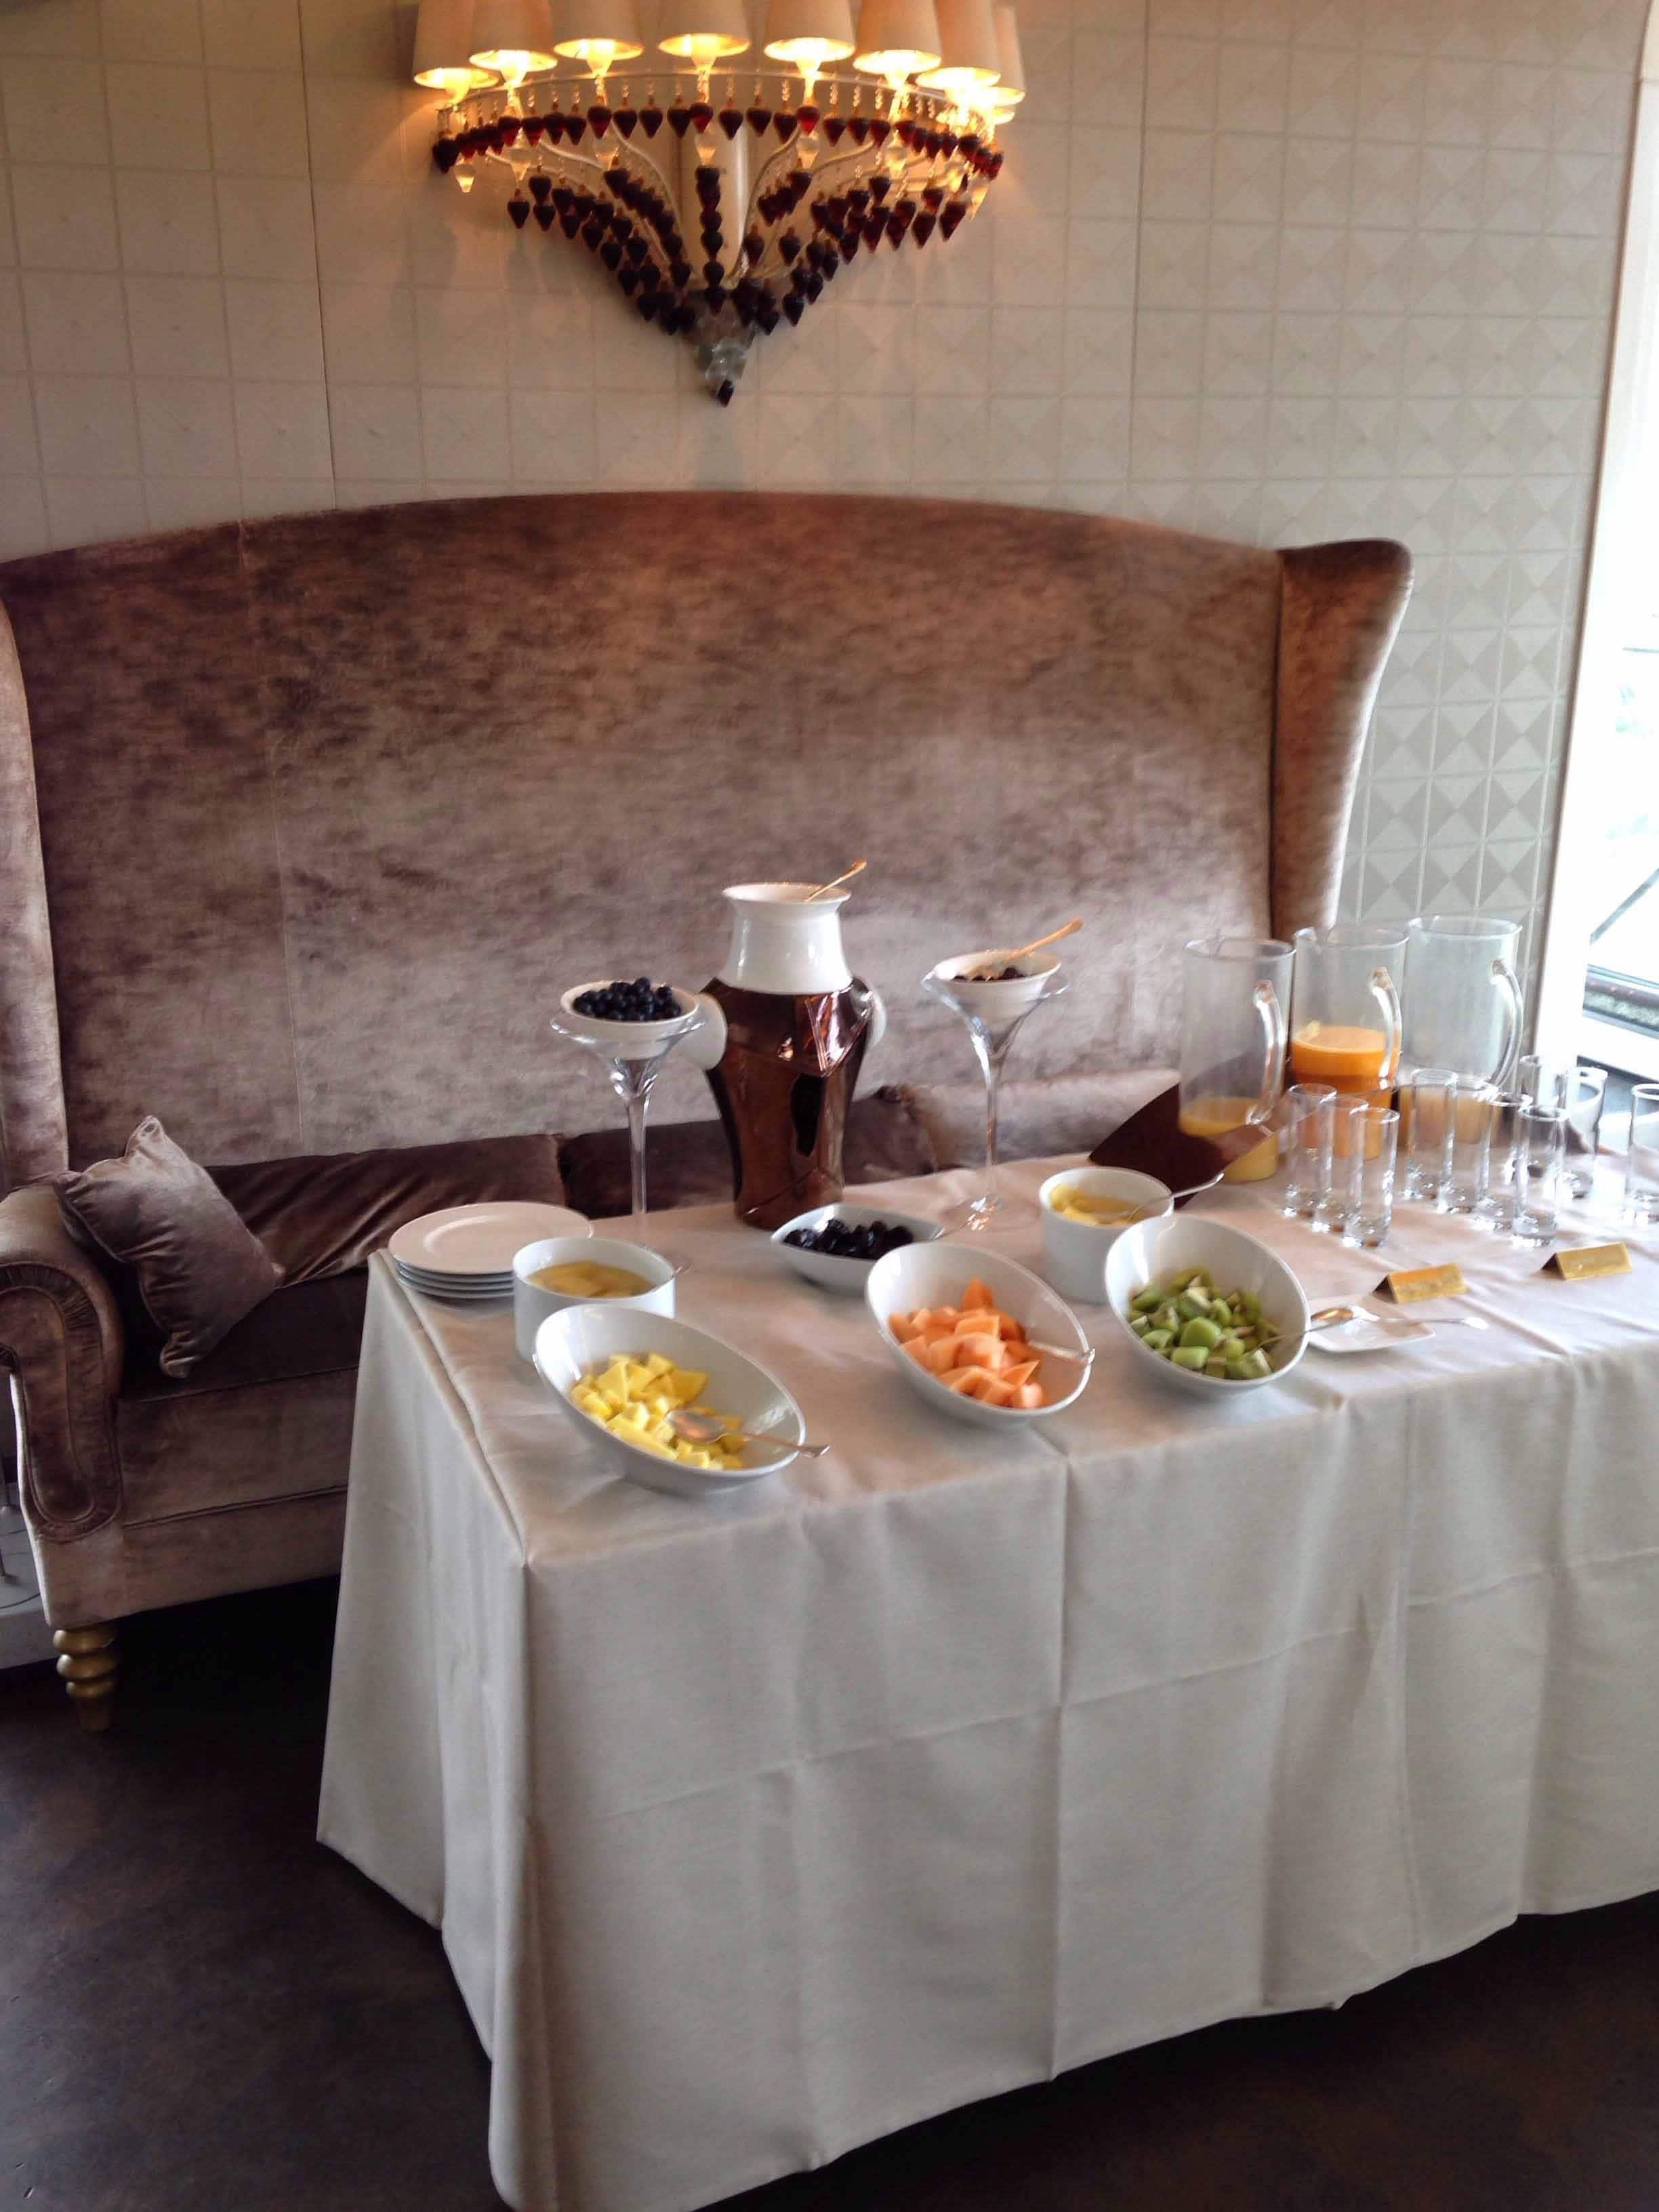 Tenuta Contessa Relais Country House aroma - palazzo manfredi, colosseo, roma का मेनू